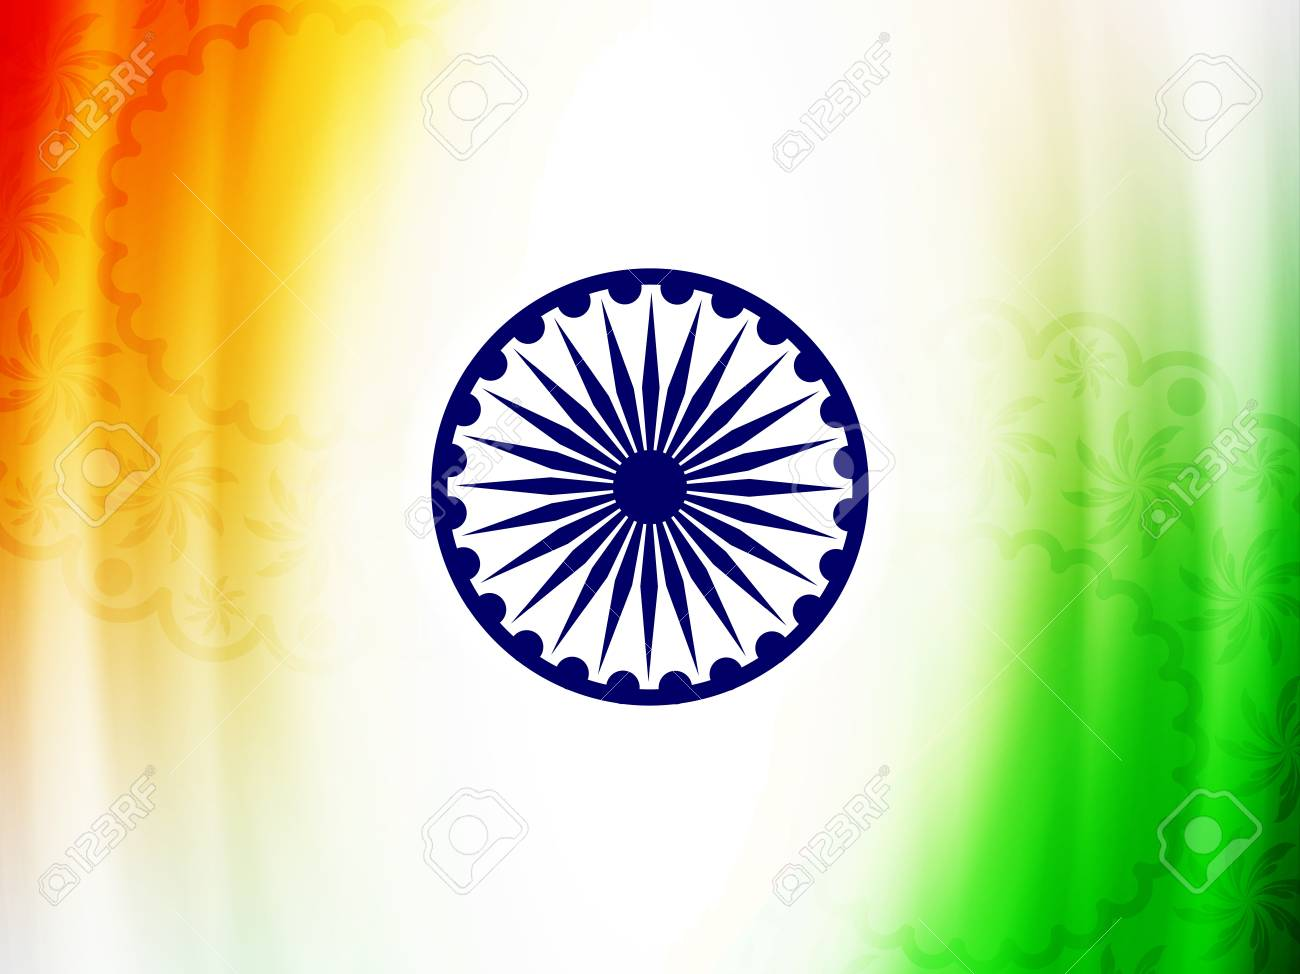 Beautiful Indian flag design Stock Vector - 21636152